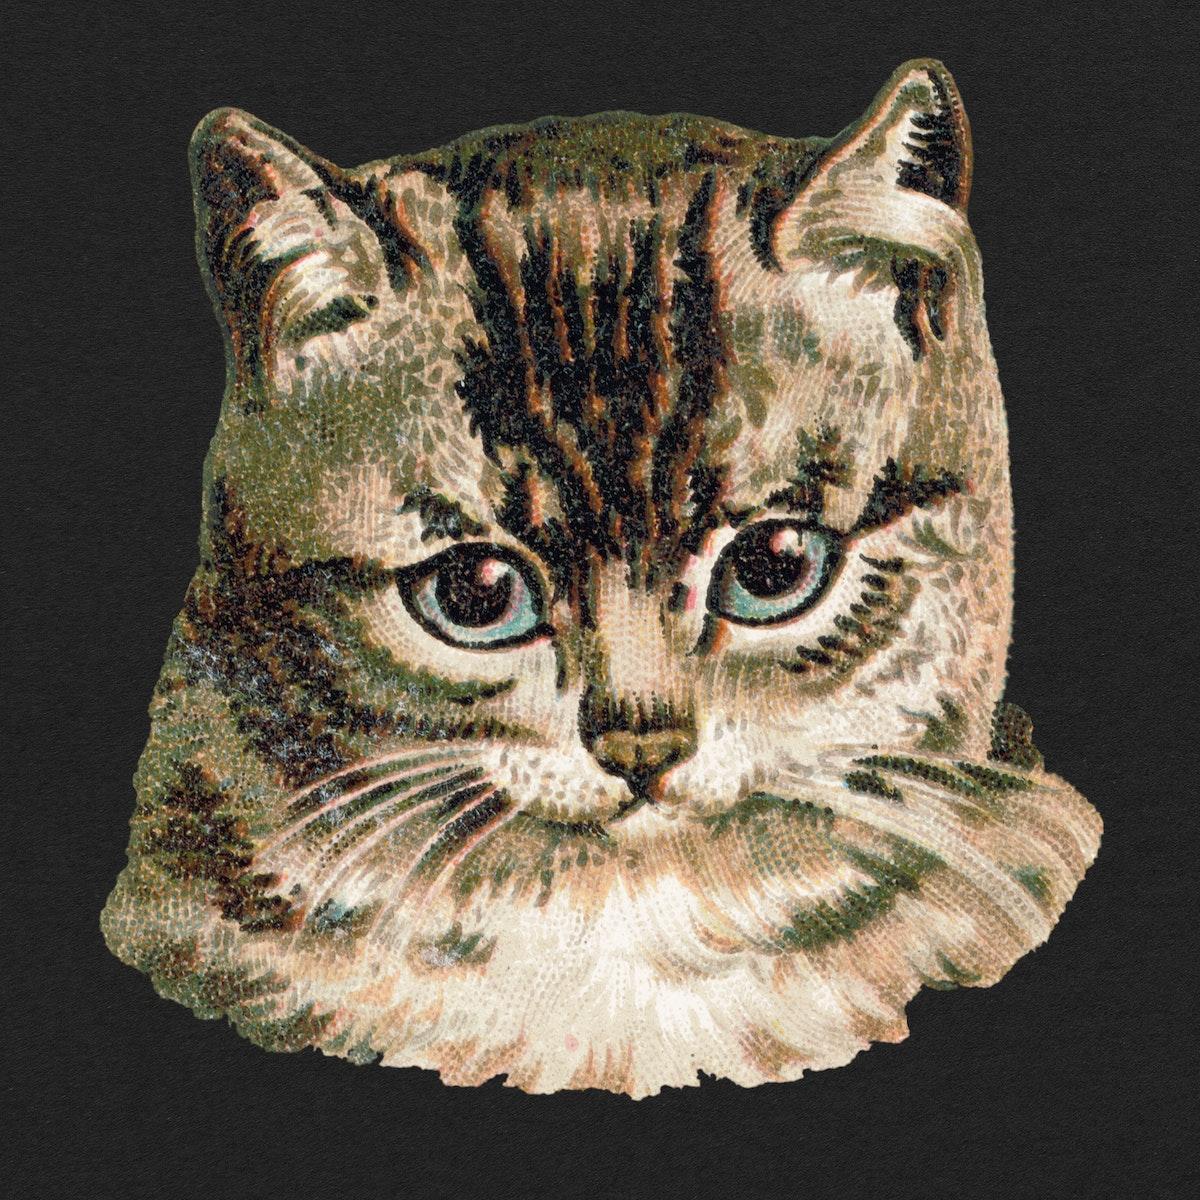 Cat illustration with black background